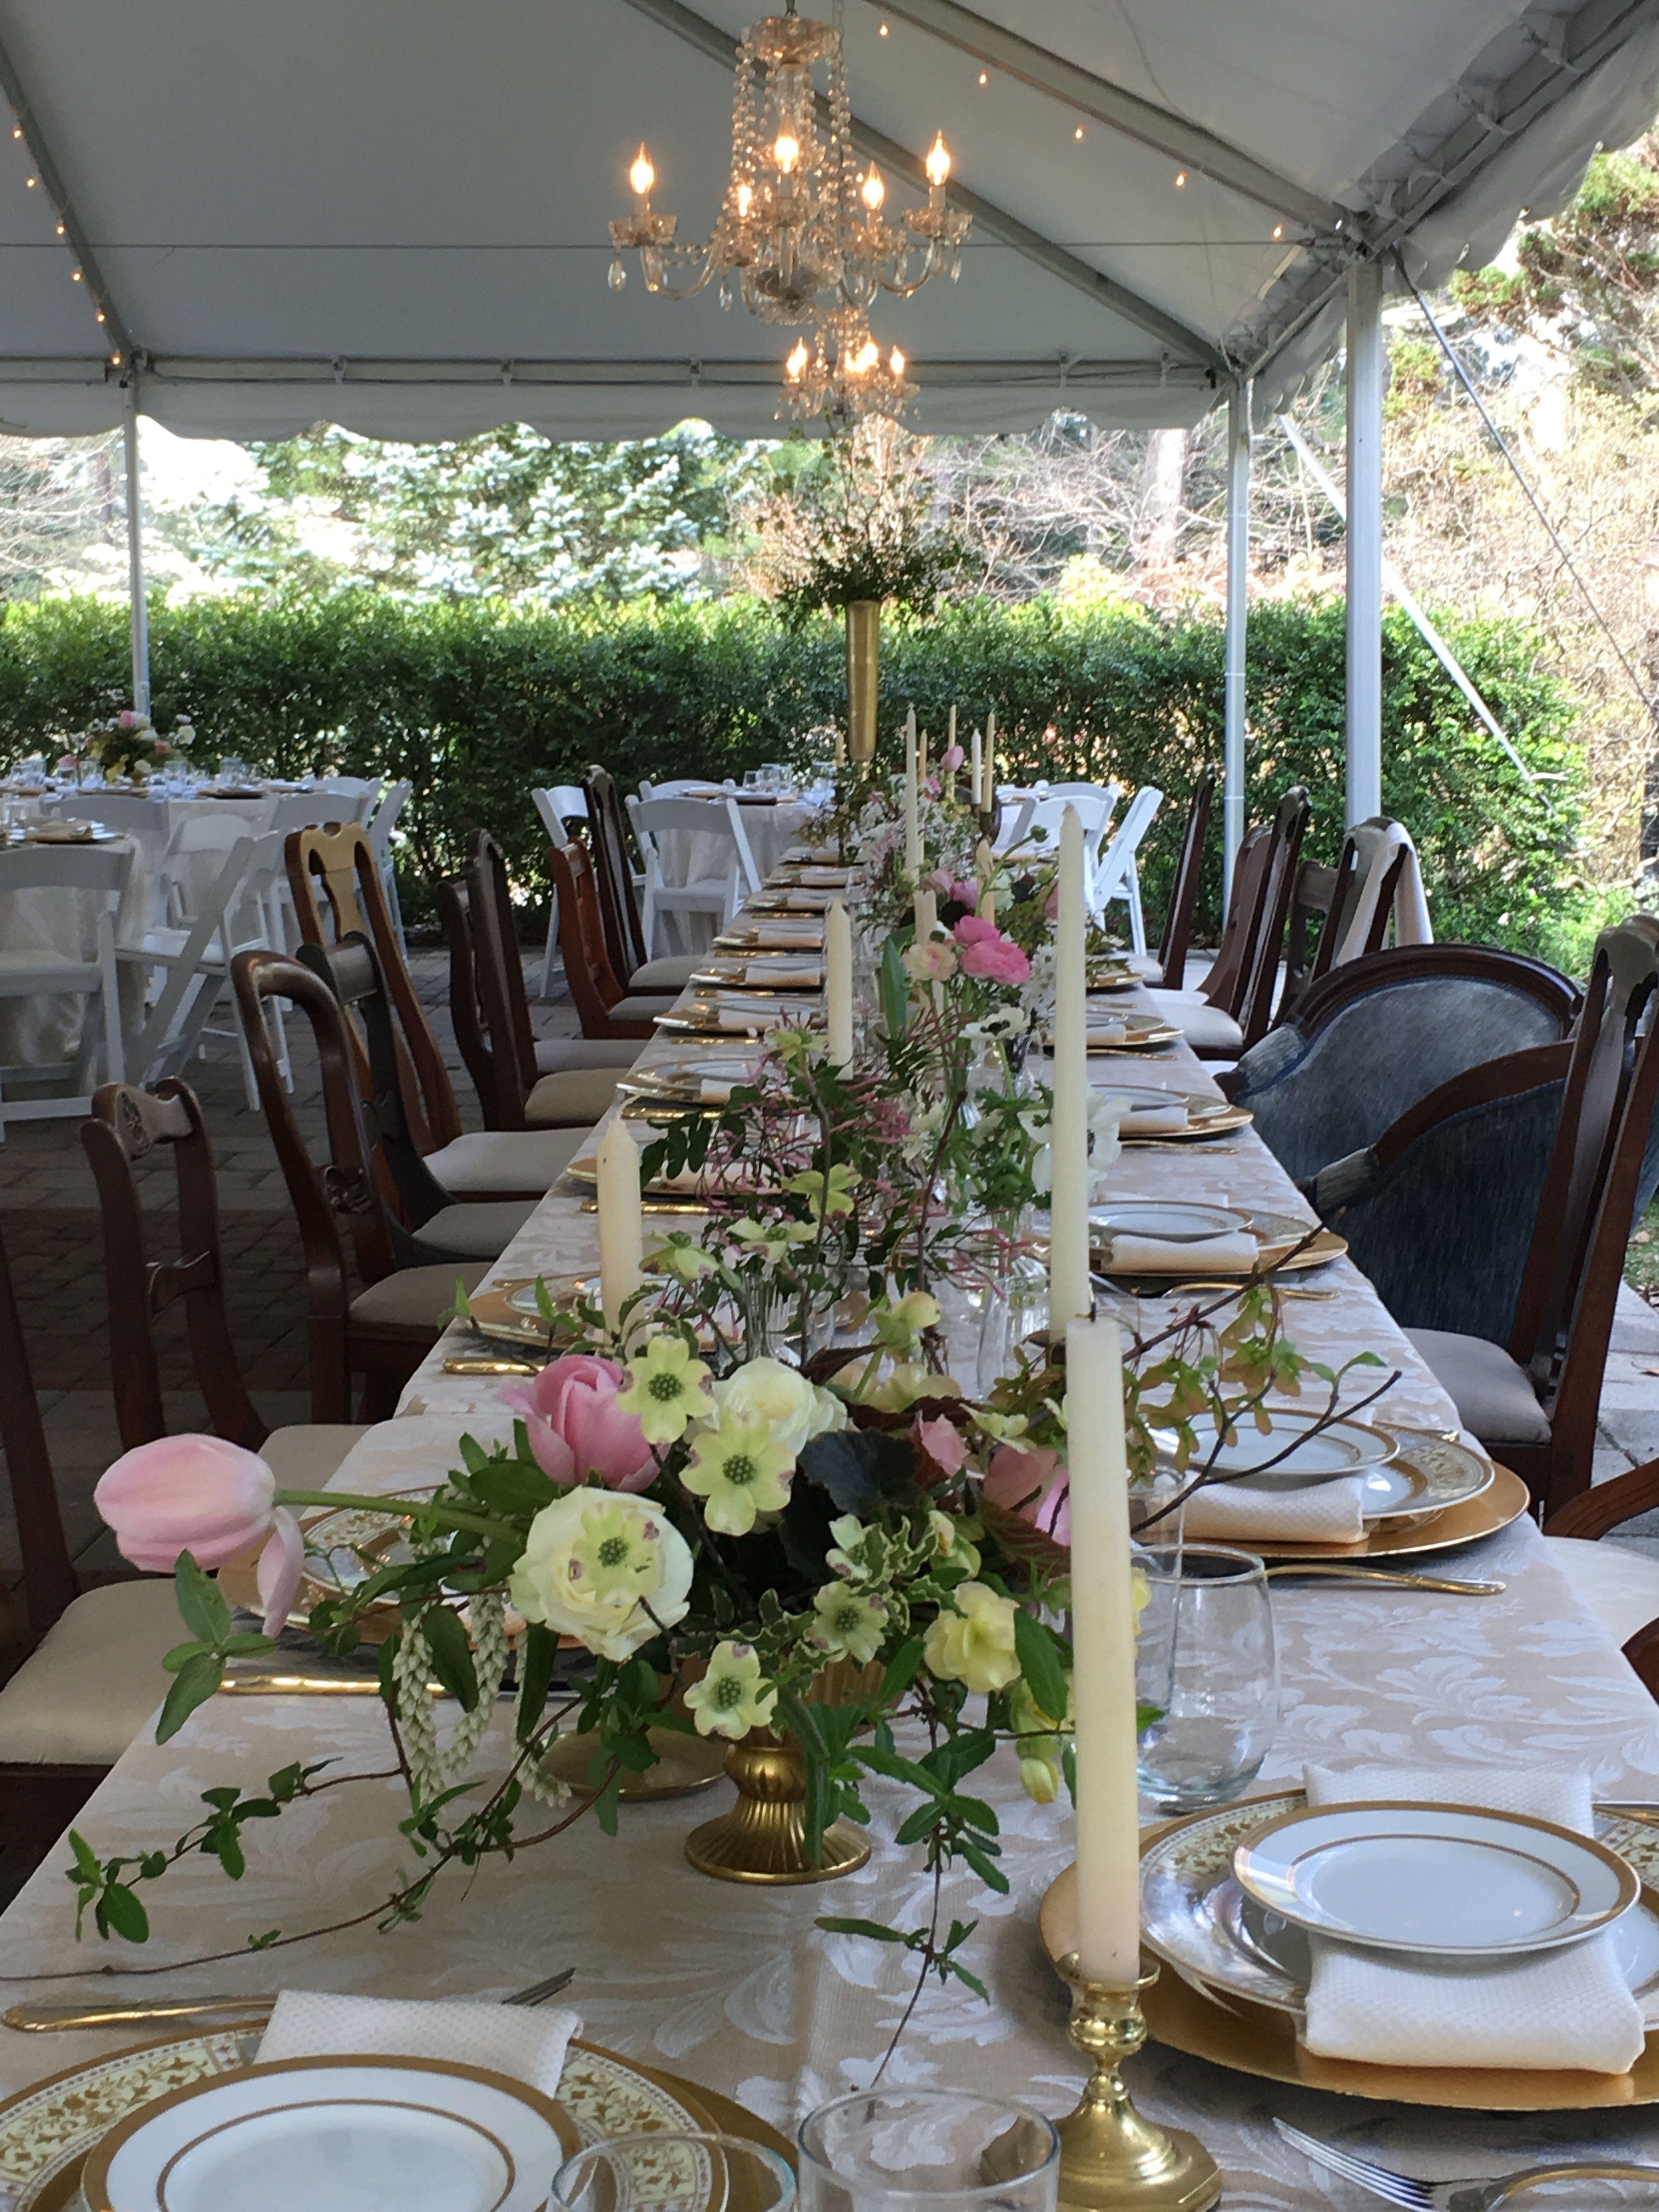 Home Lewis ginter botanical garden, Beautiful weddings